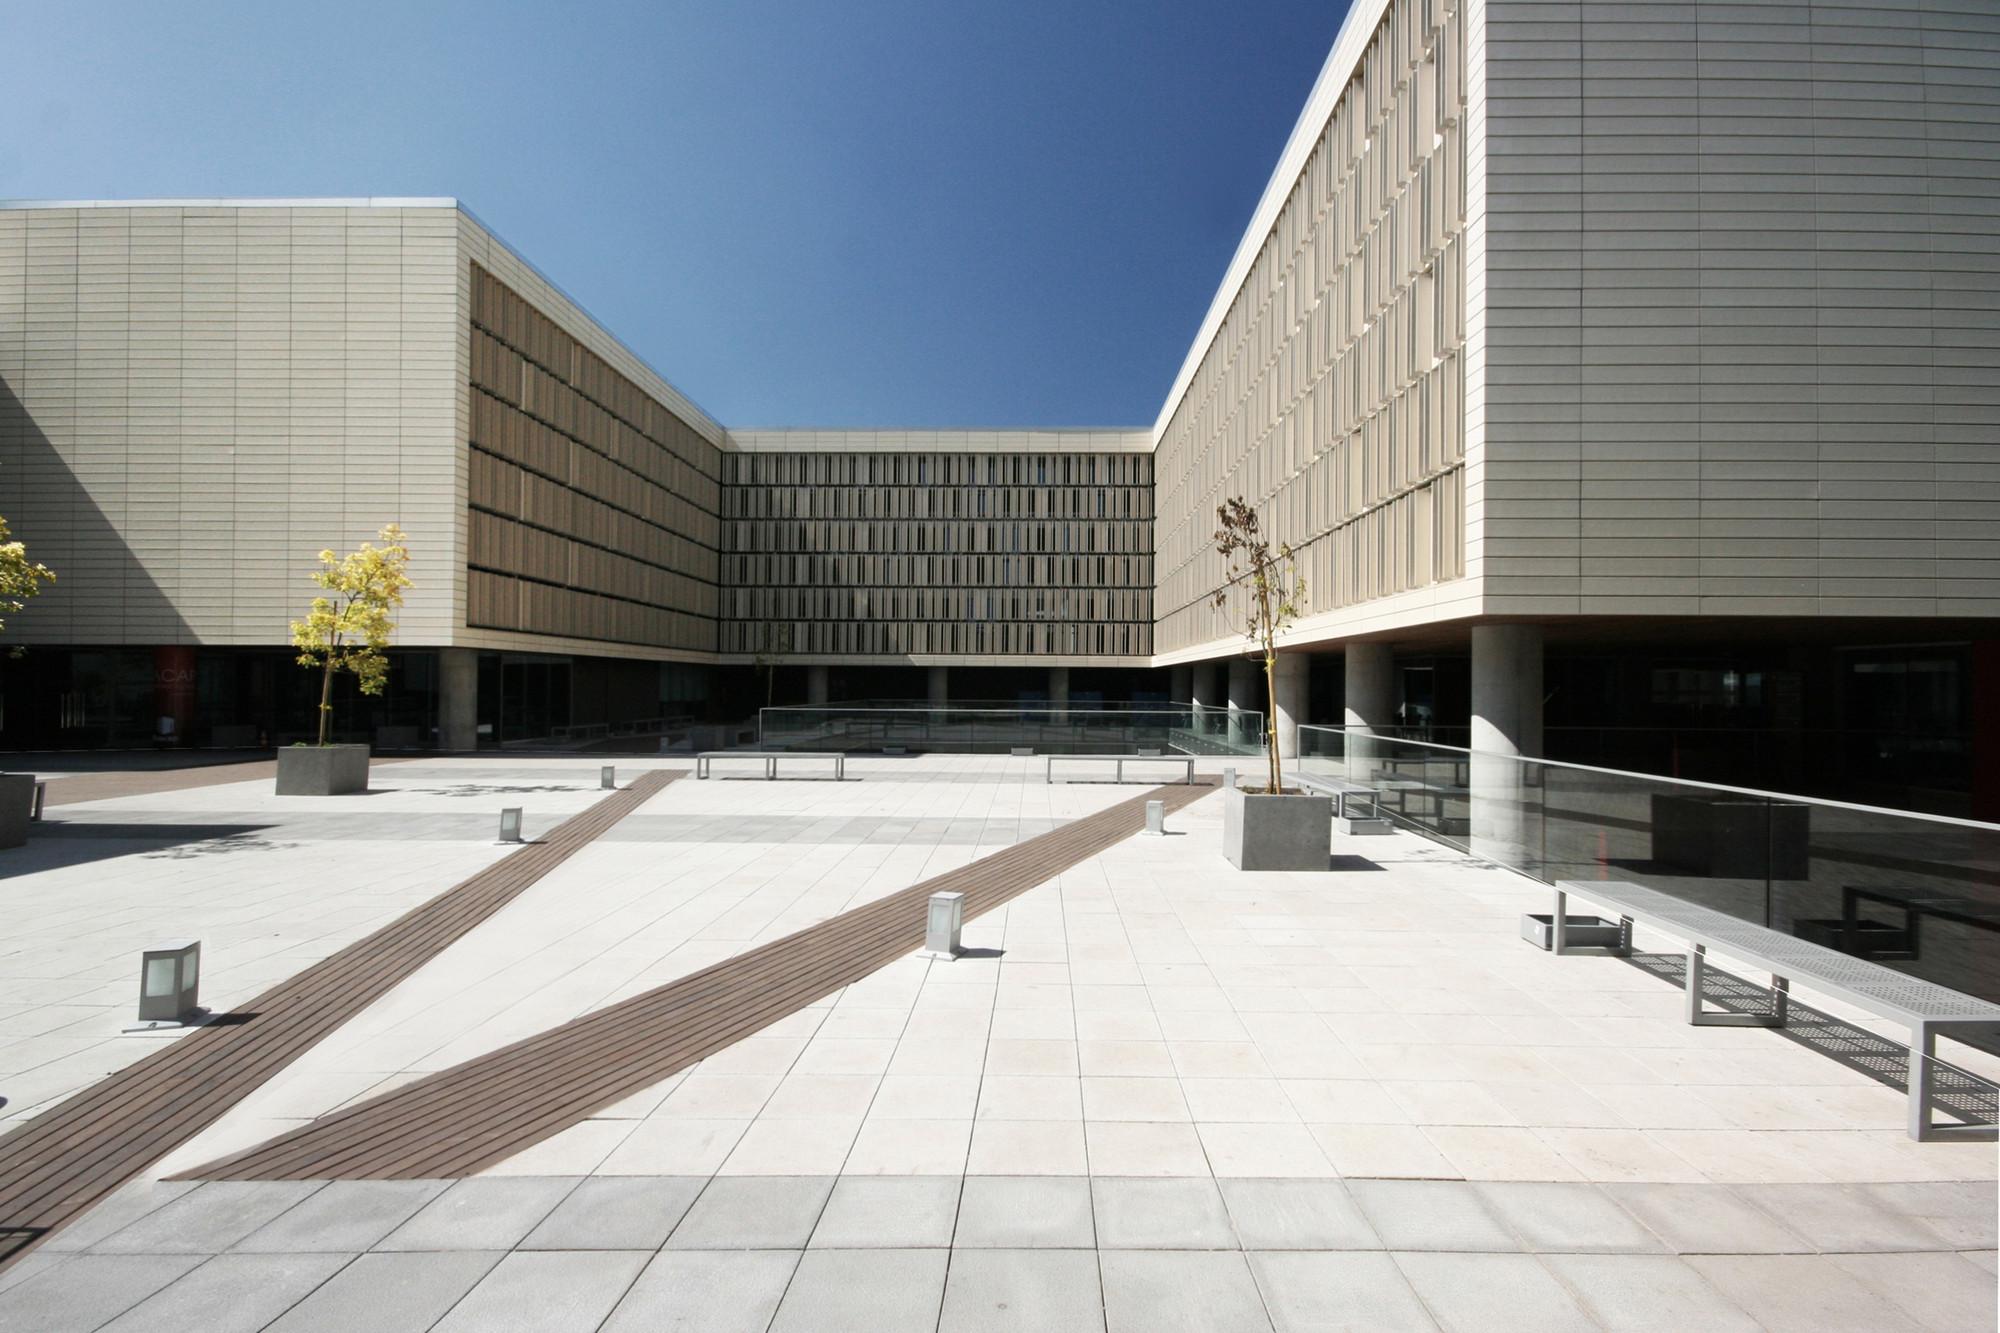 New Downtown Santiago Inacap Campus  / Estudio Larrain, © Rodrigo Larraín Illanes